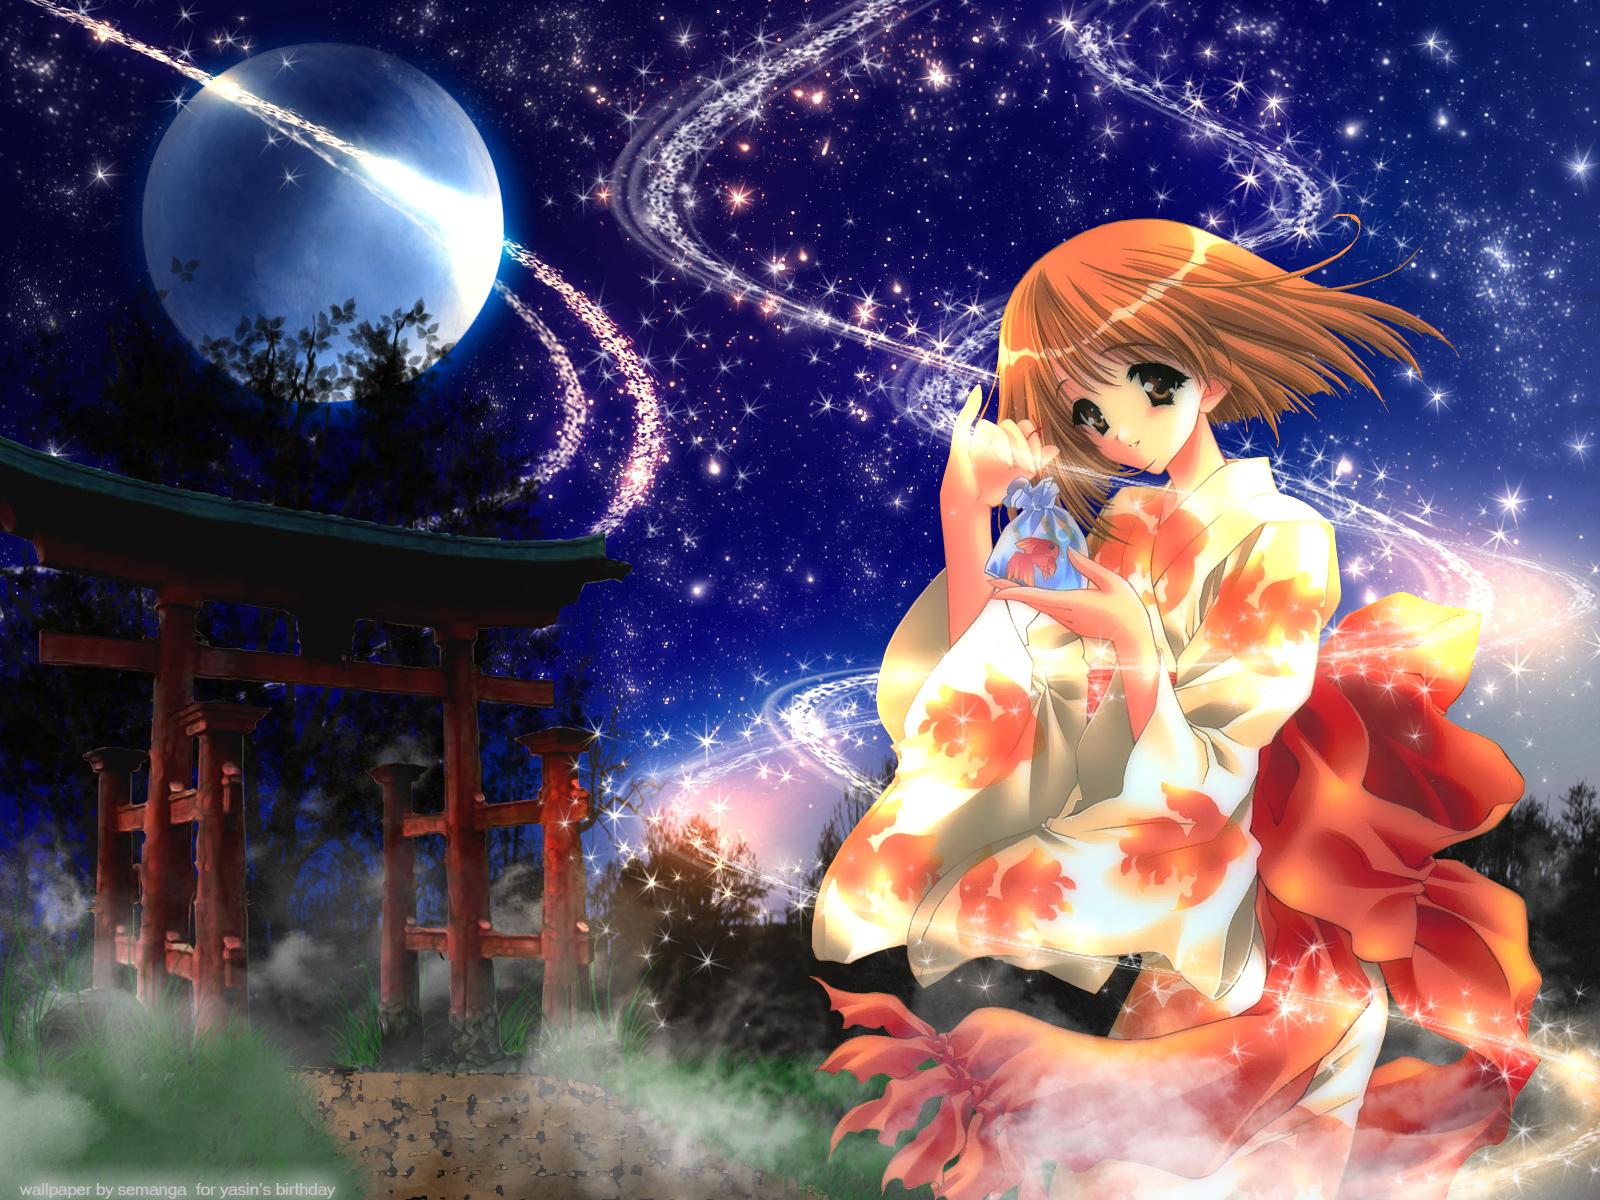 anime girls anime wallpaper 32978141 fanpop